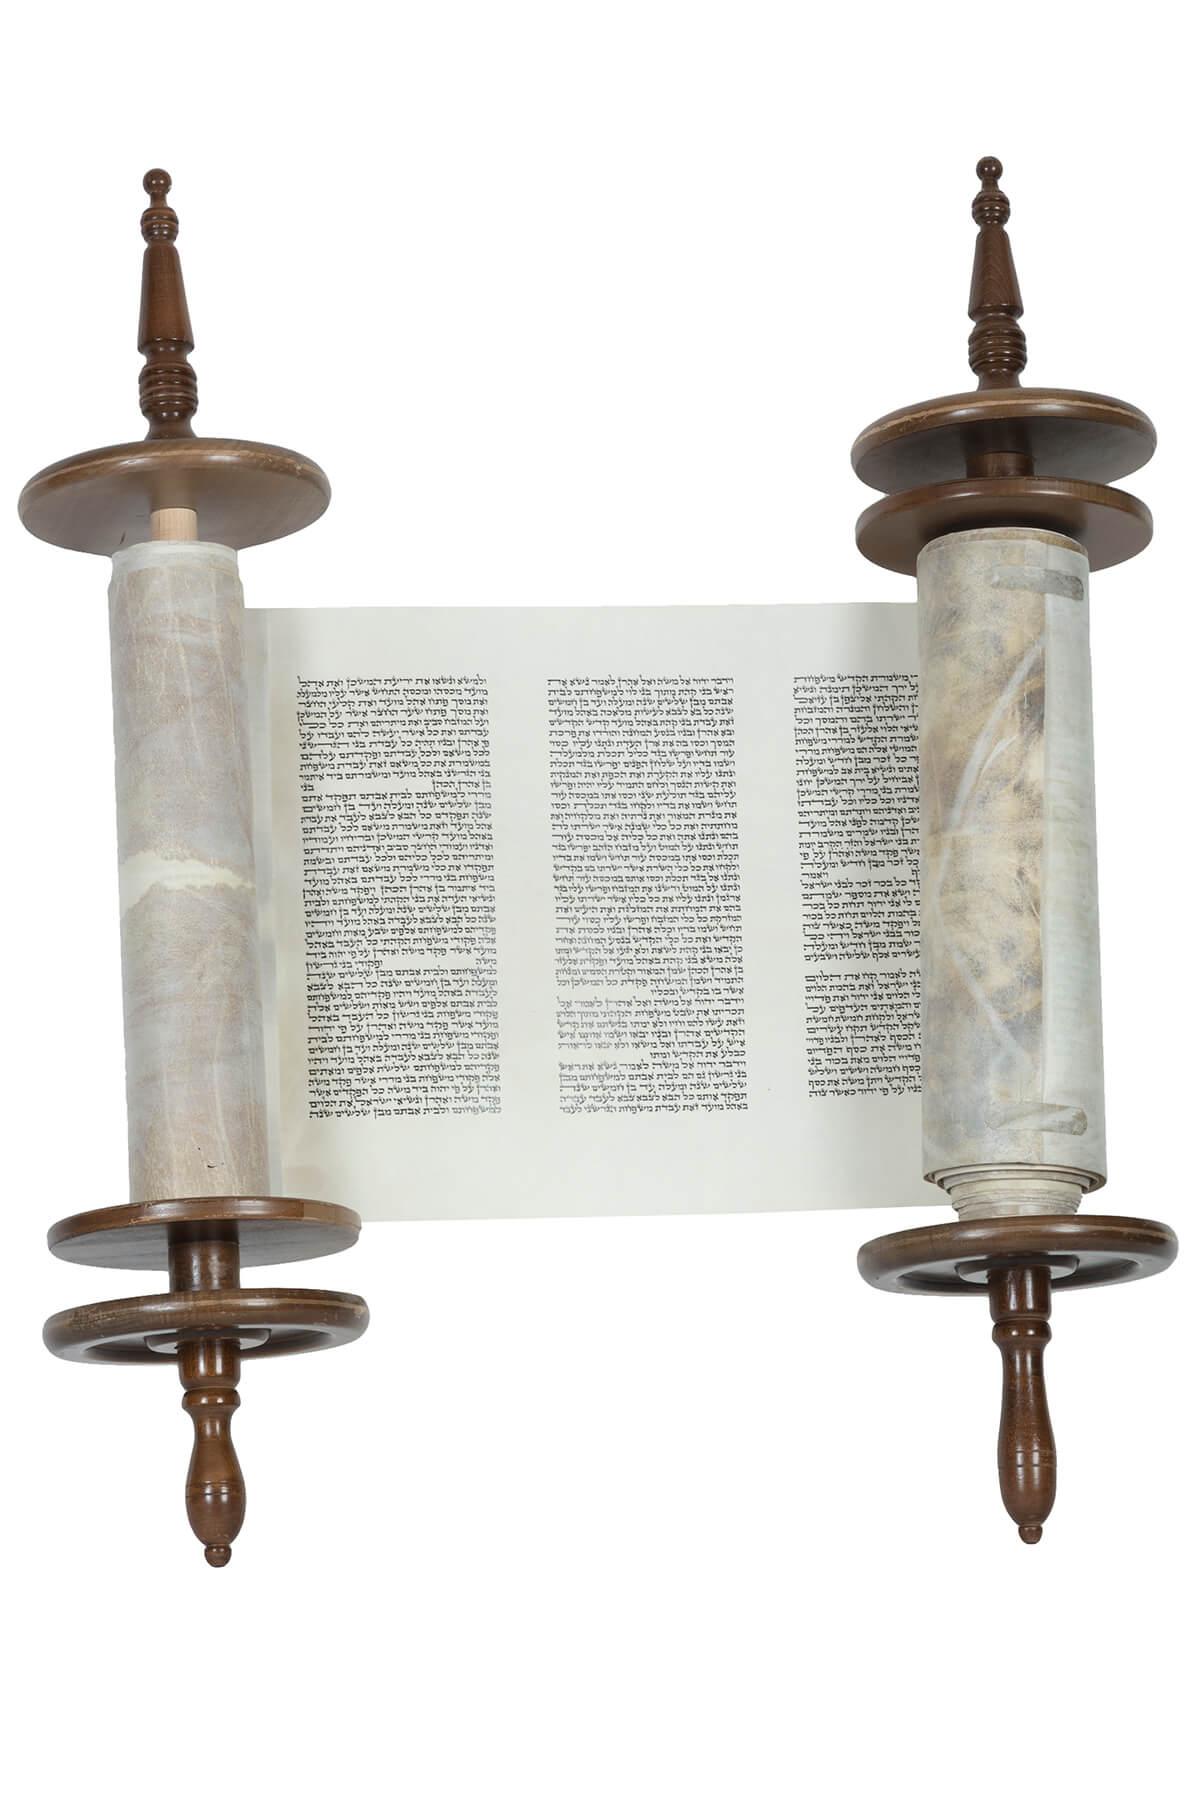 93. A Sefer Torah